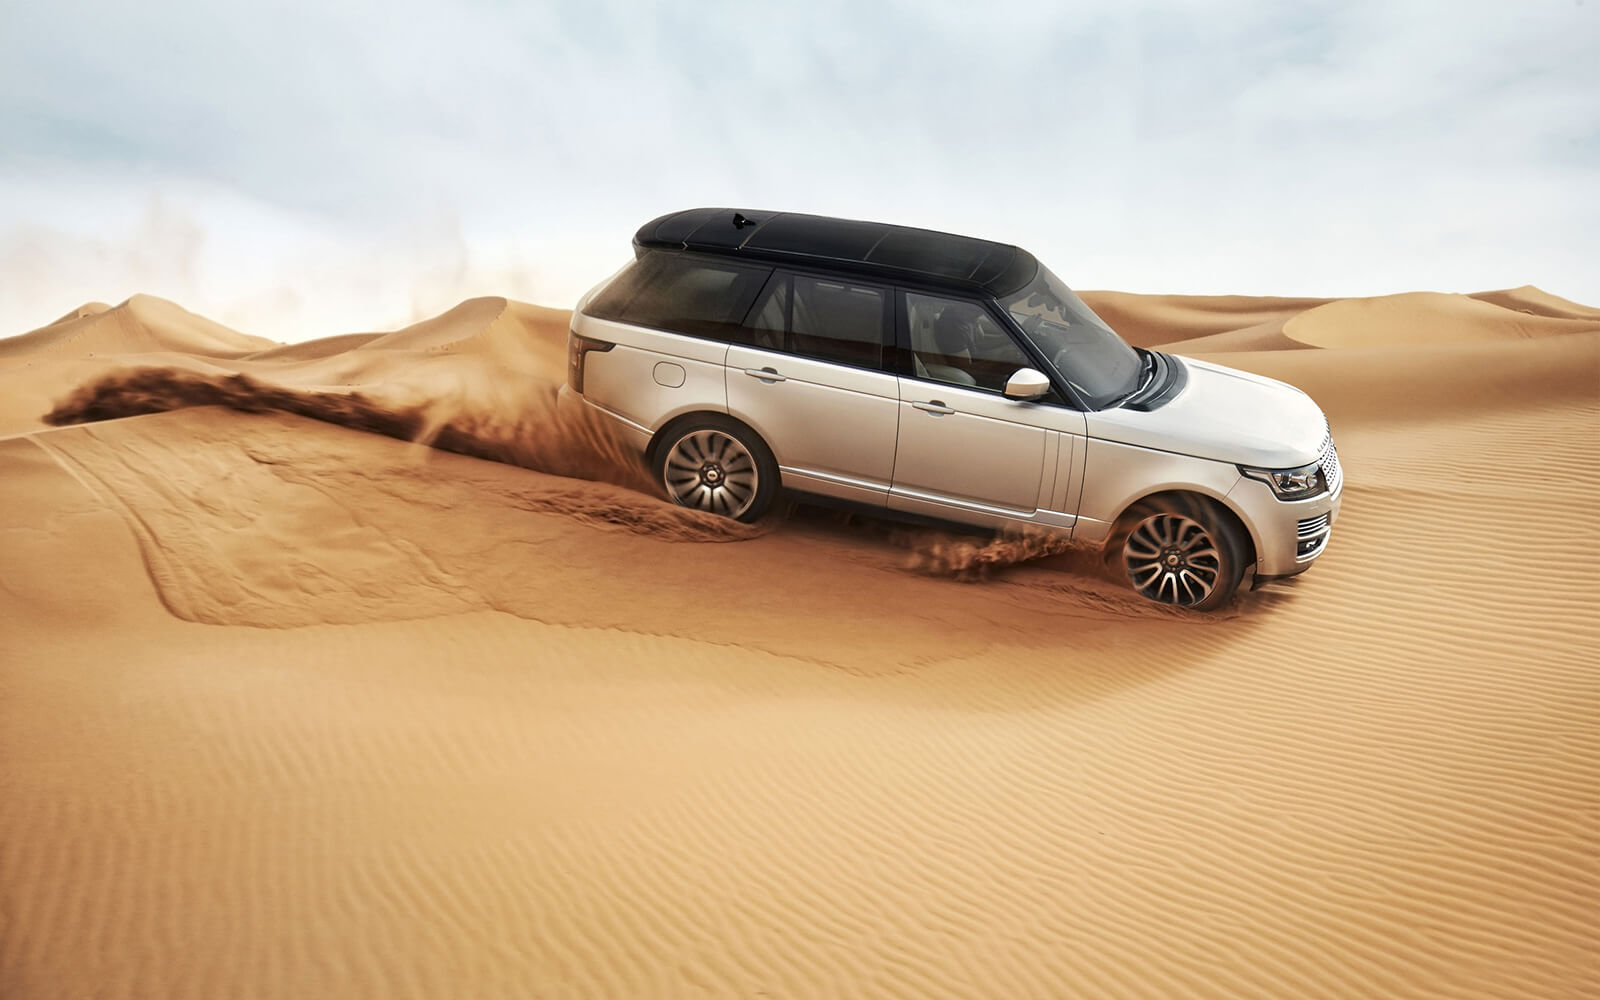 Beautiful-Land-Rover-Range-Rover-Wallpaper